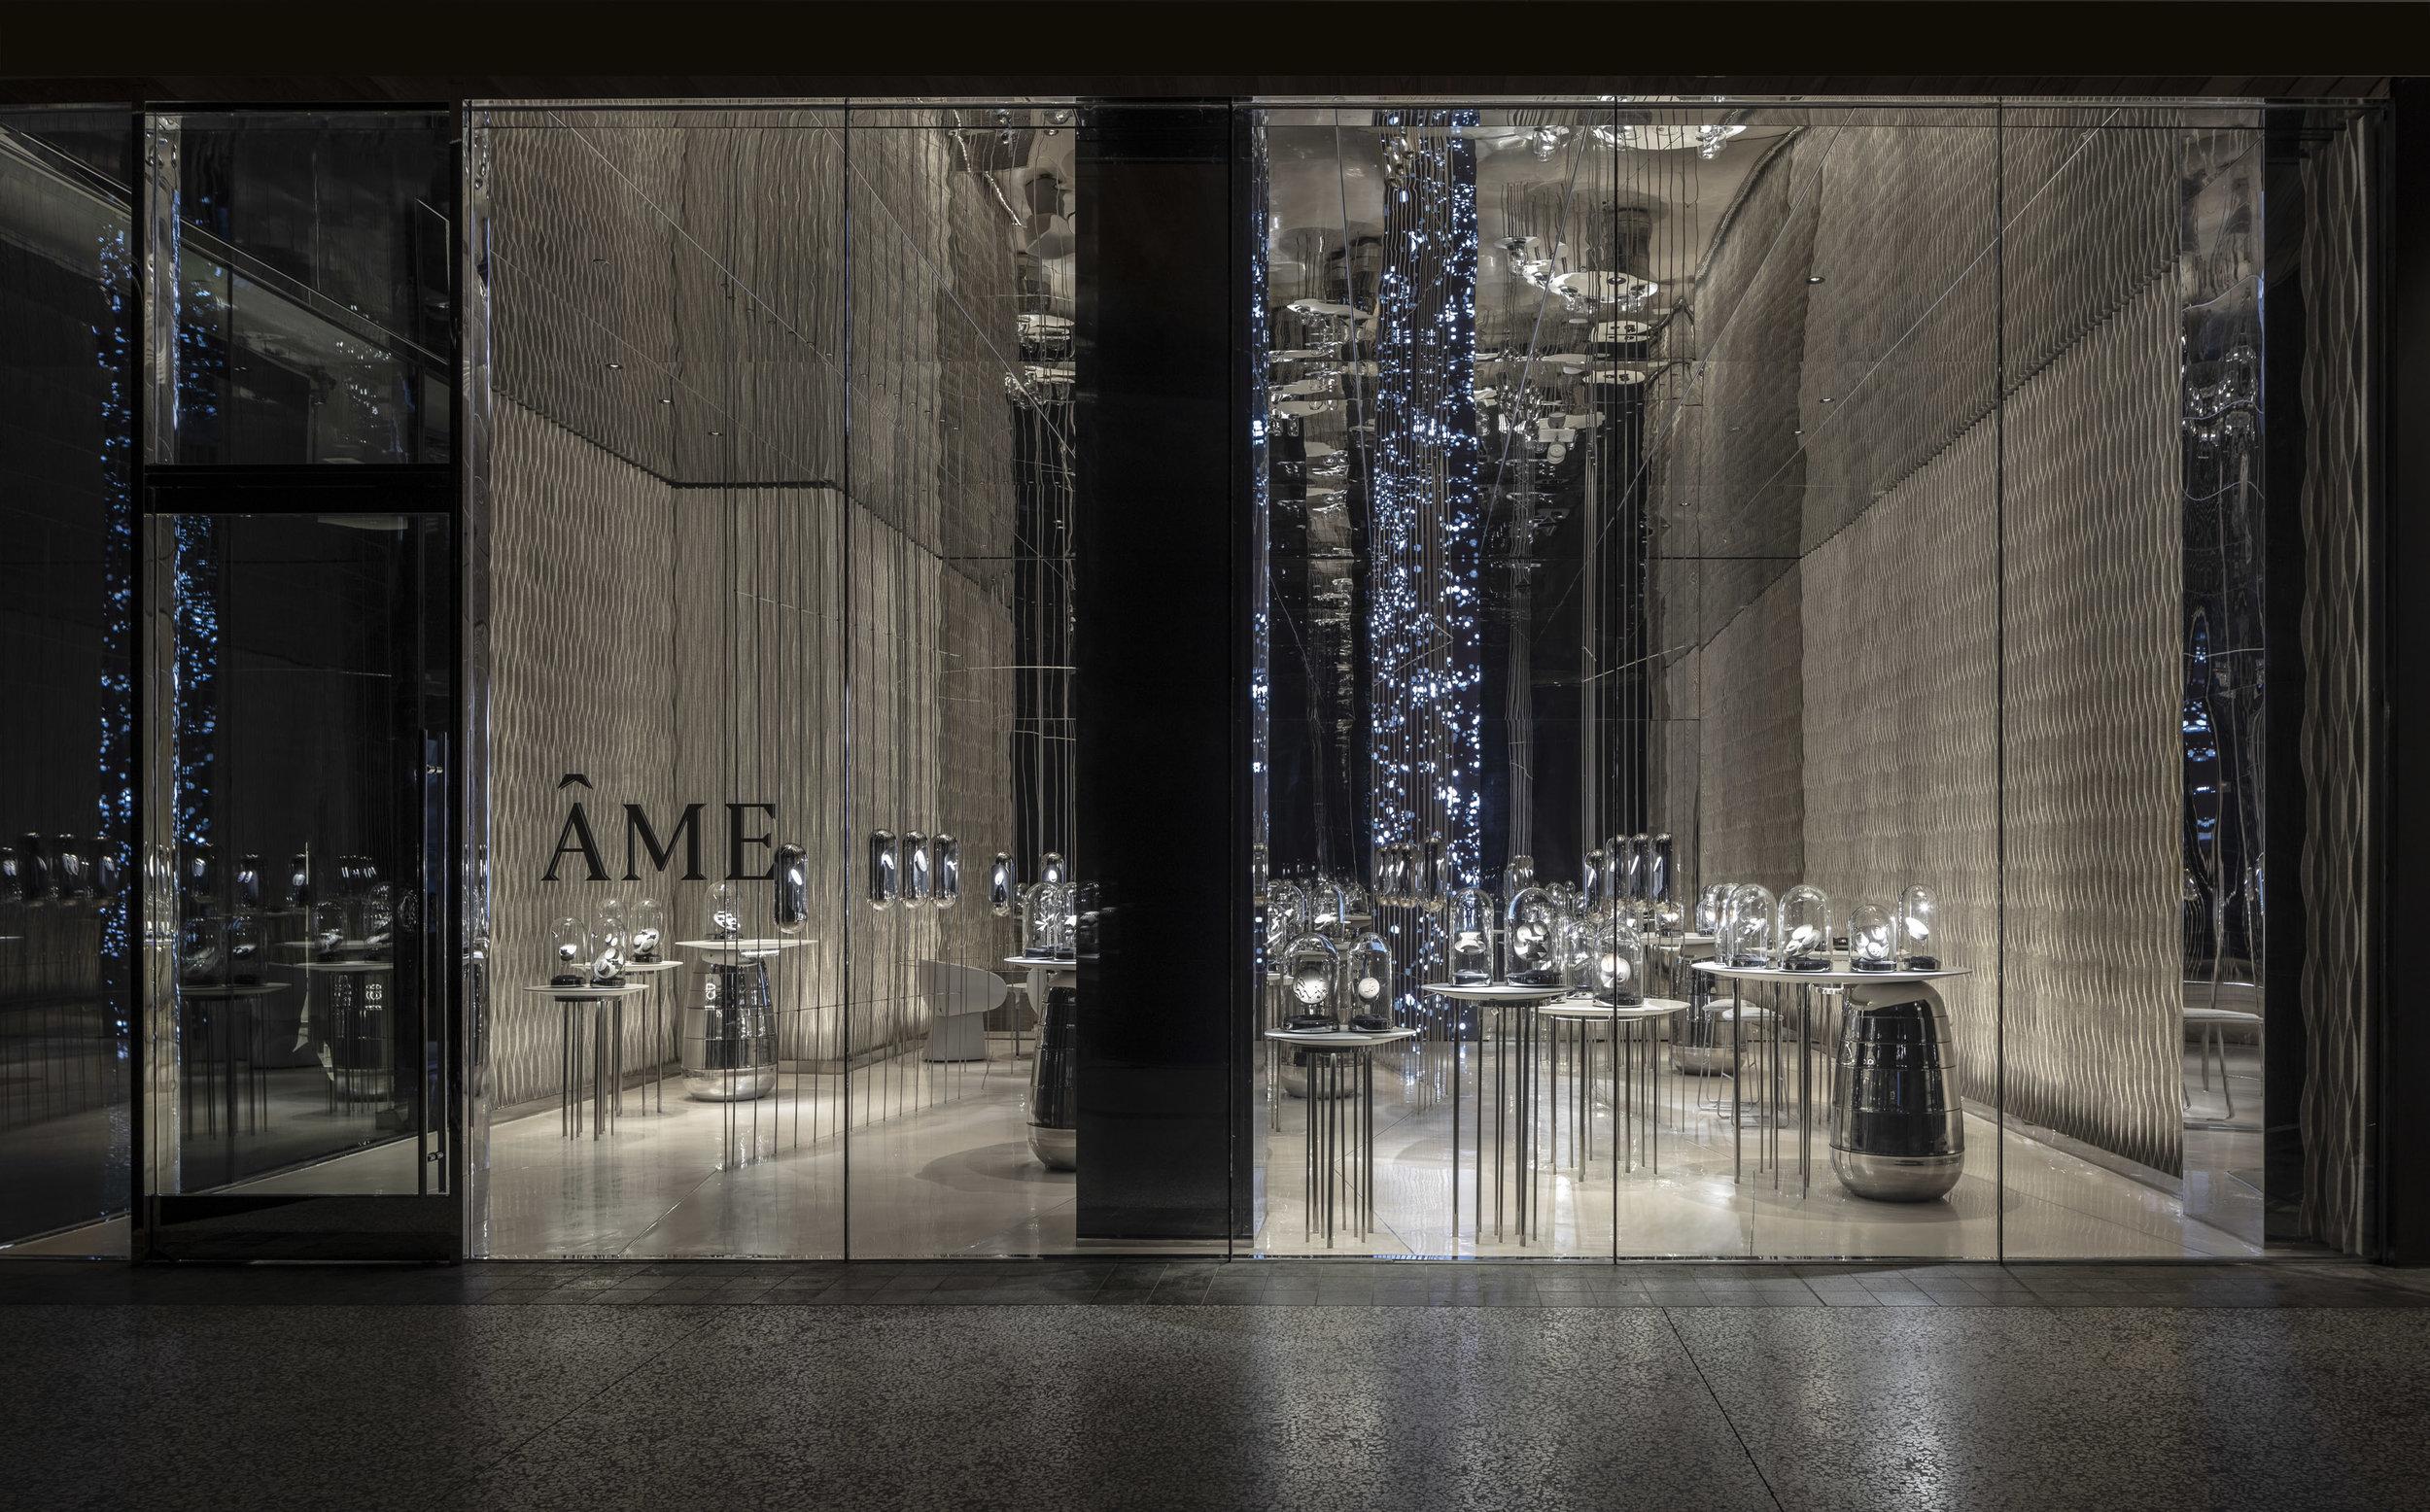 Âme-jewelry-la-store-branding-sum-07